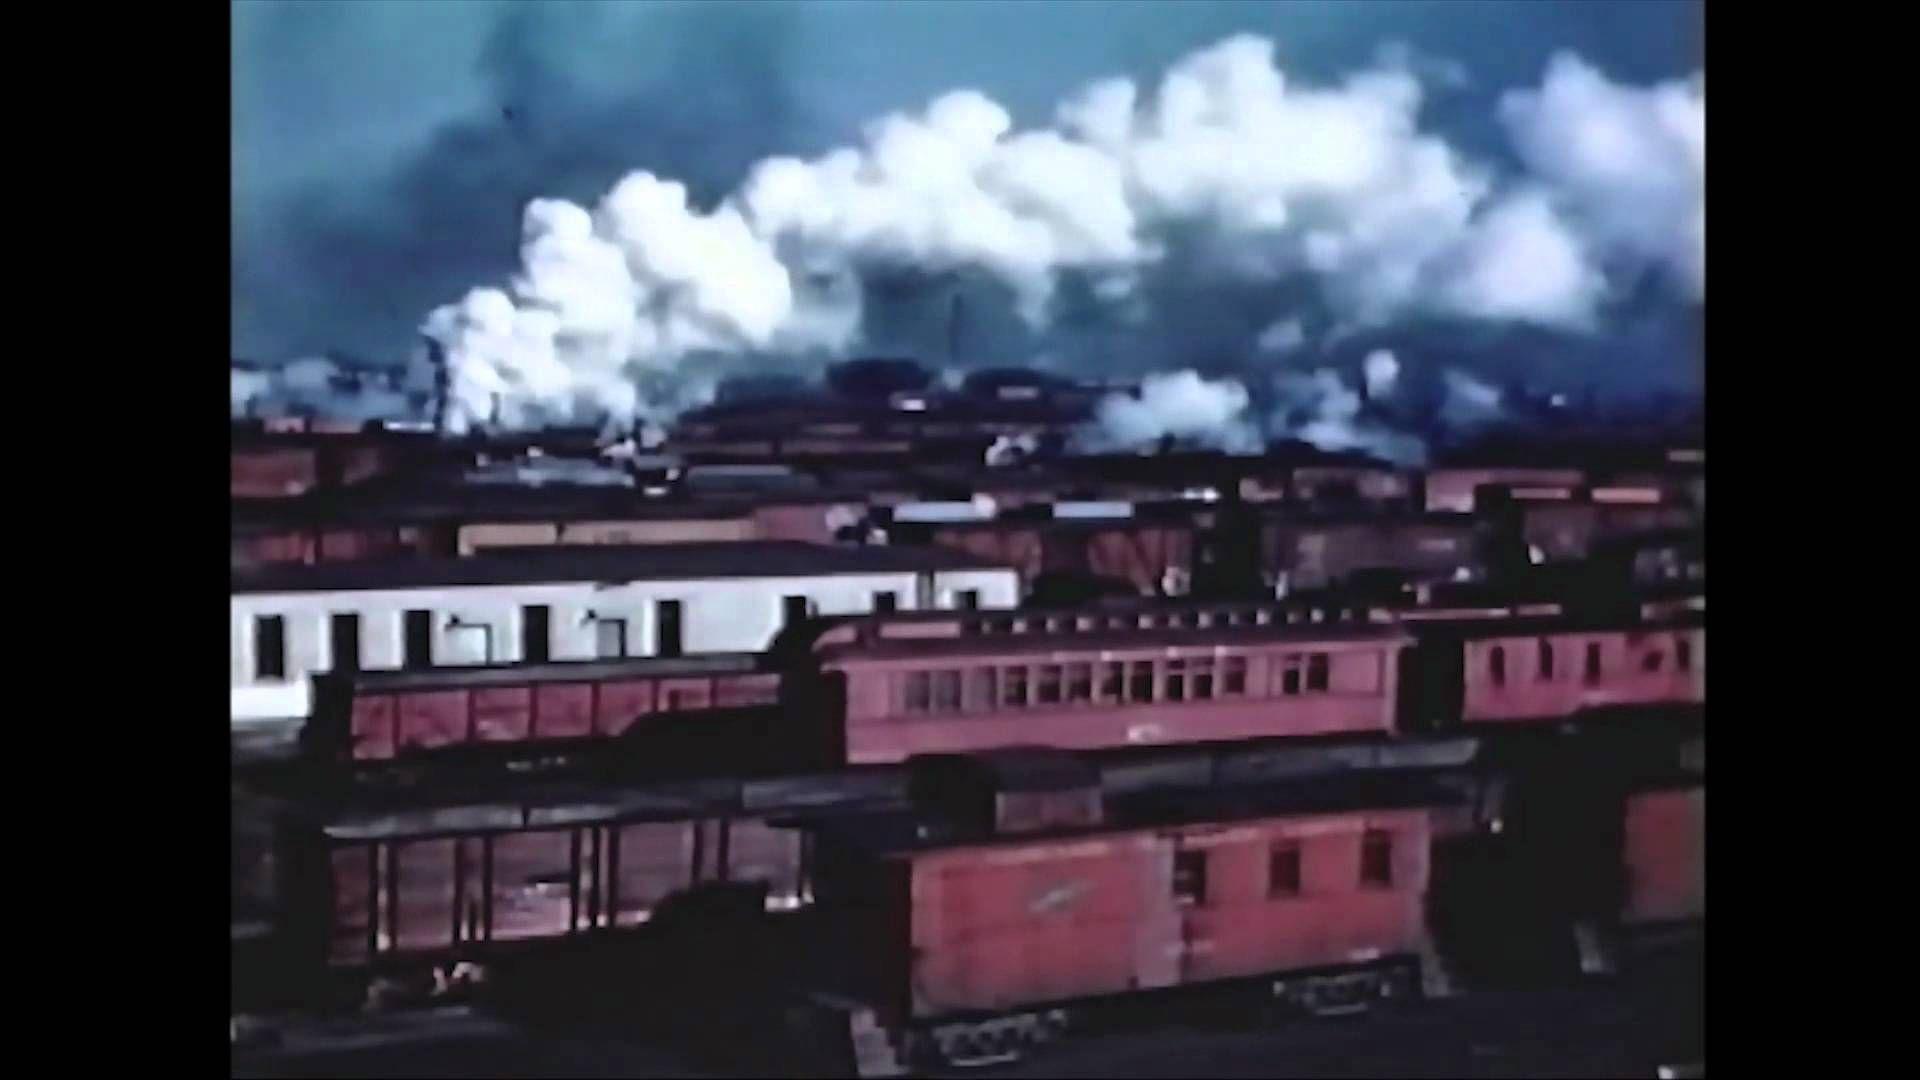 "1940's American Trains in War Effort ""Lifeline of the Nation"" - Associat..."